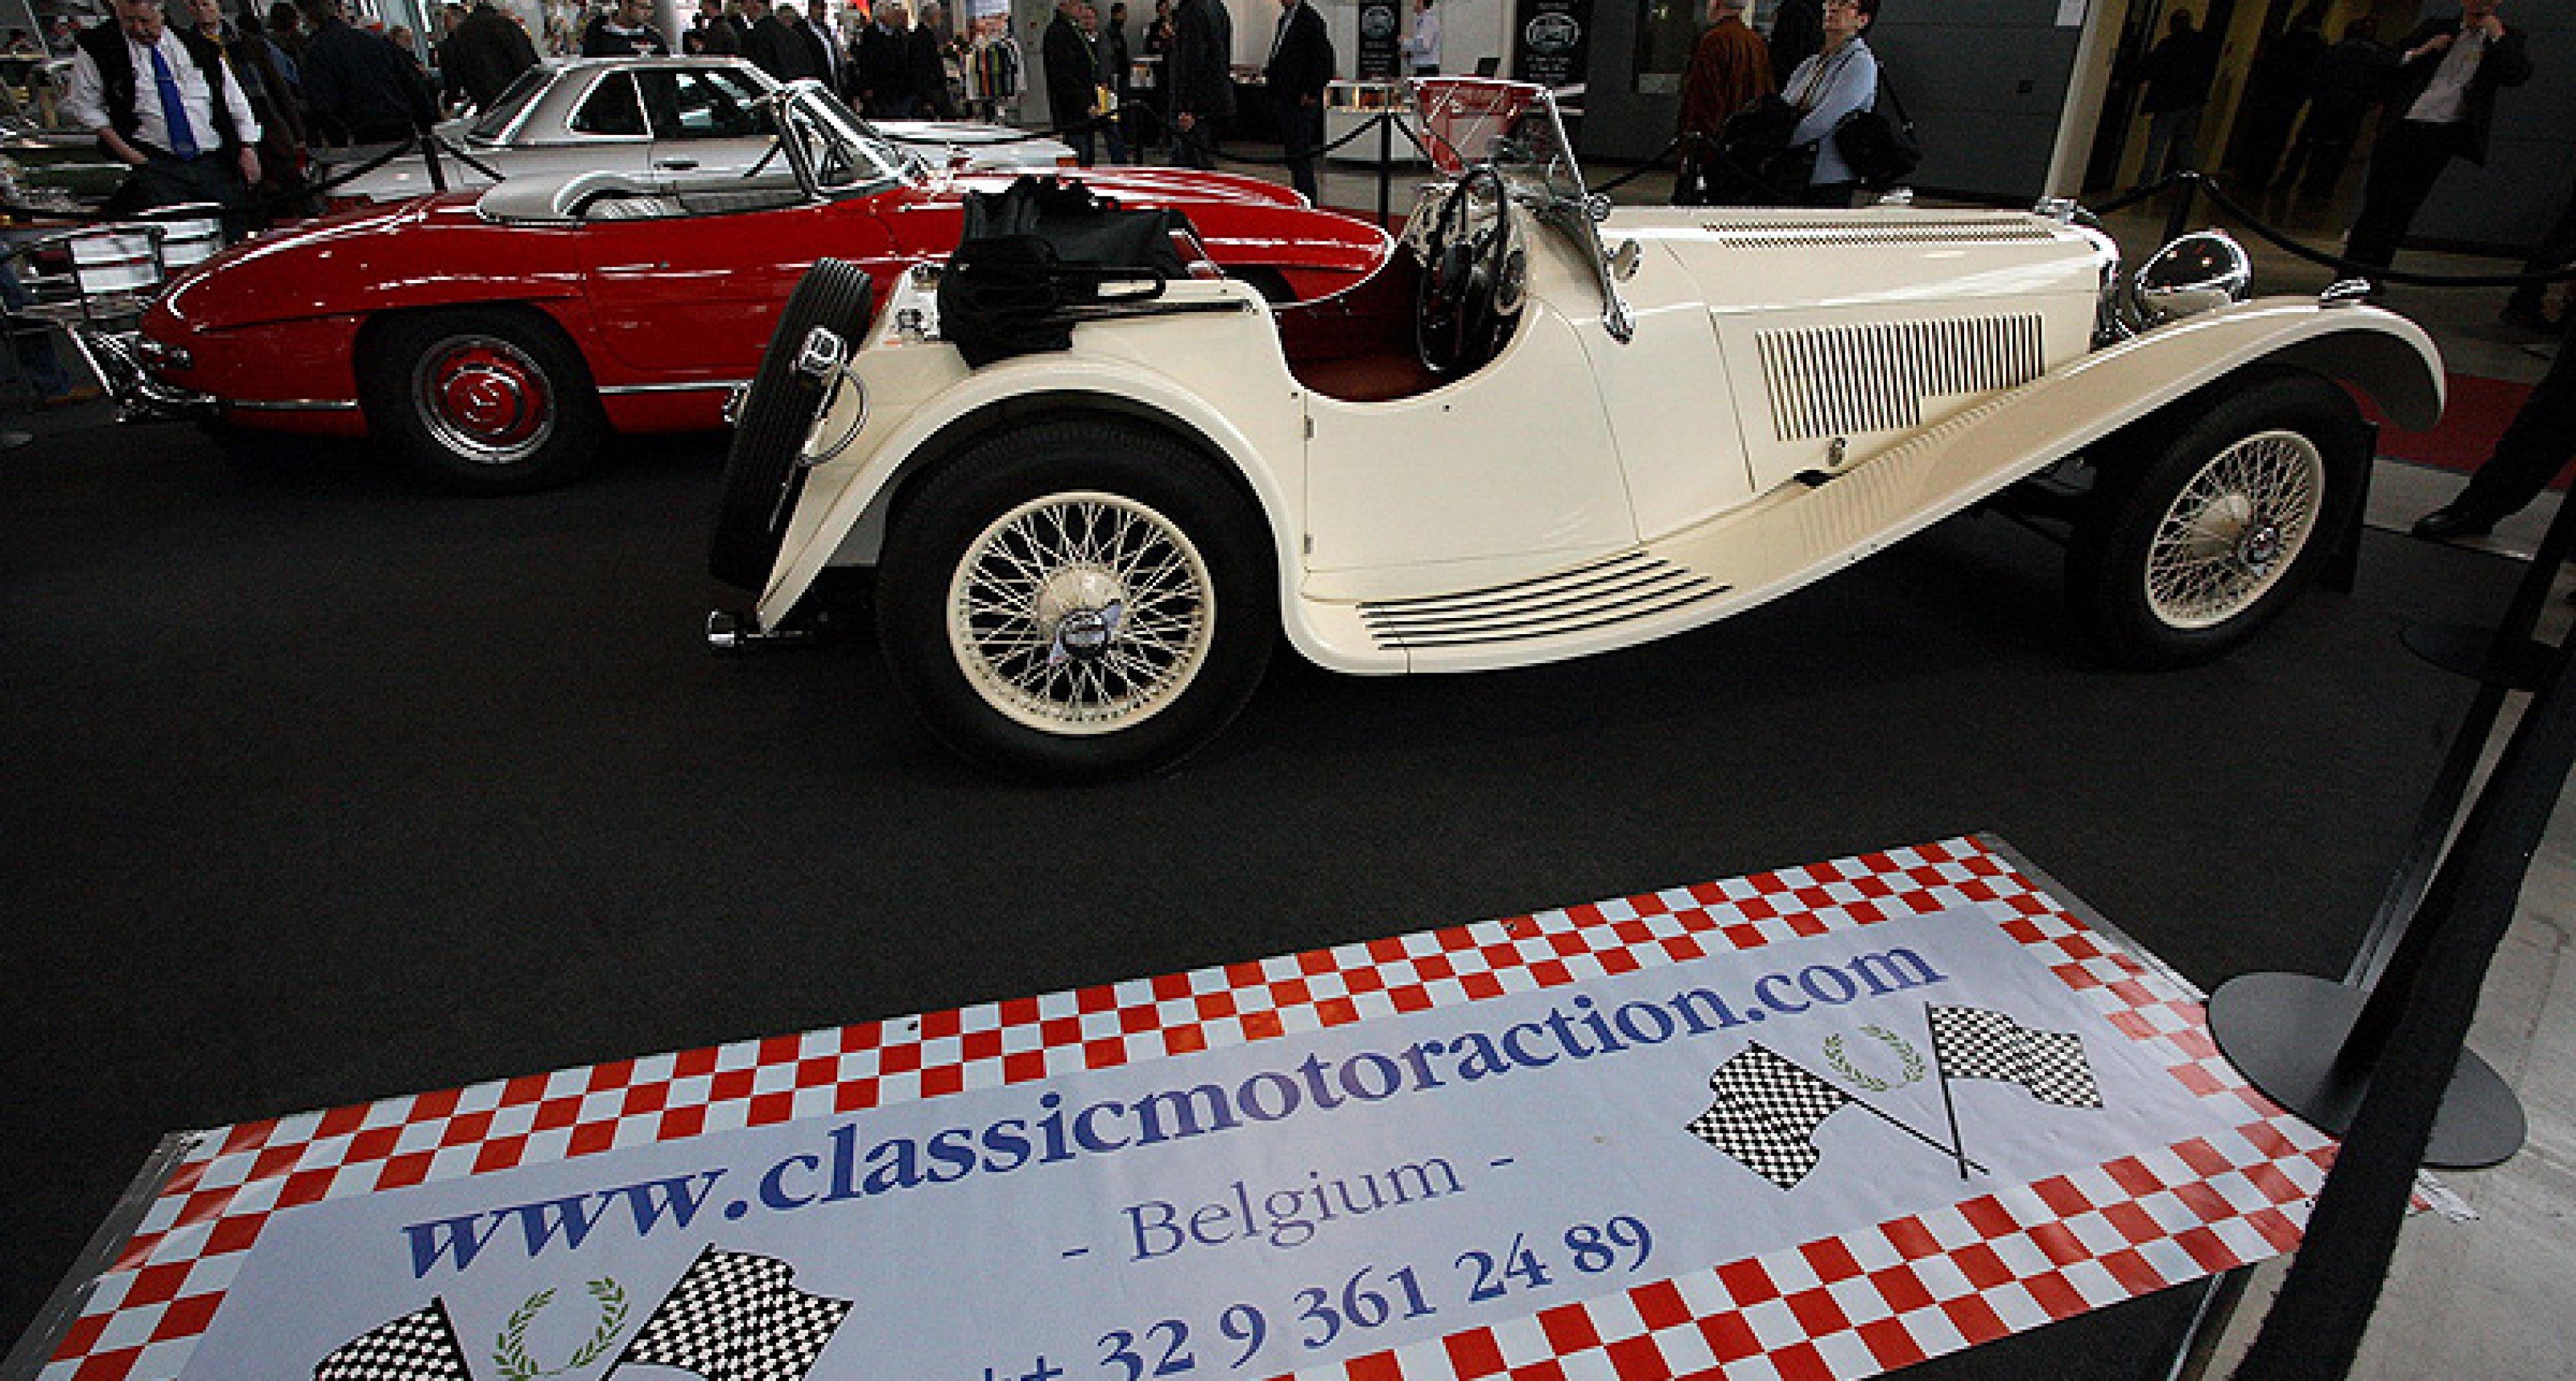 Retro Classics 2011: Stuttgart zieht!